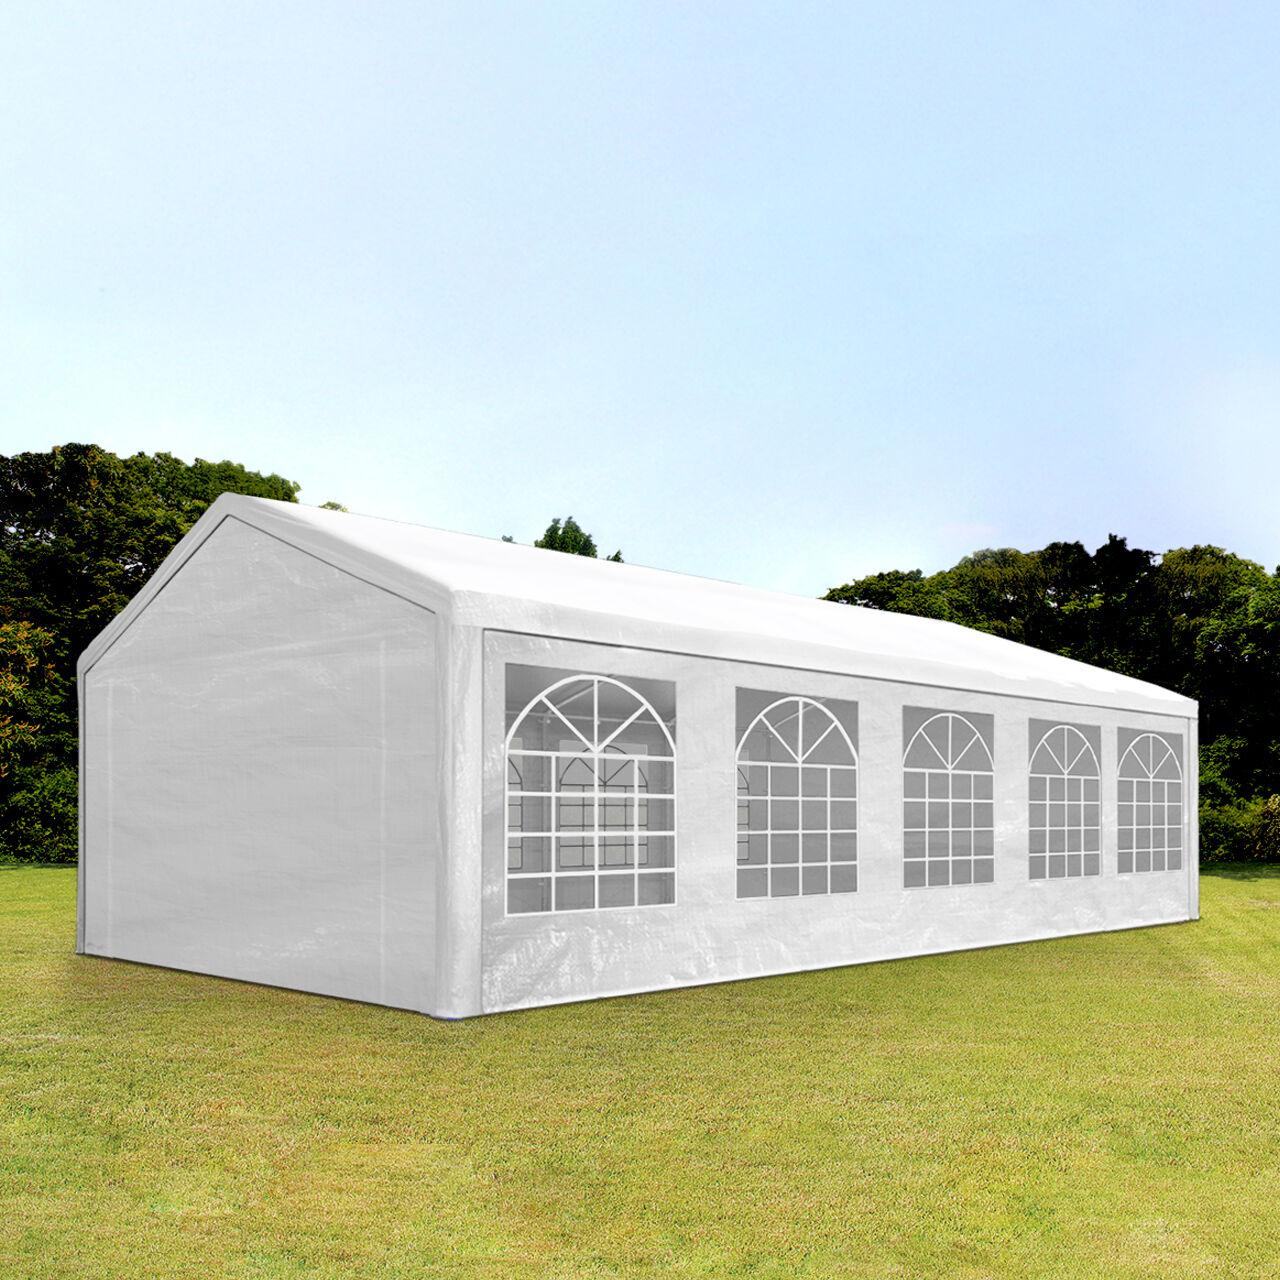 Toolport Tendone per Feste 4x10m PE 180g/m² bianco impermeabile